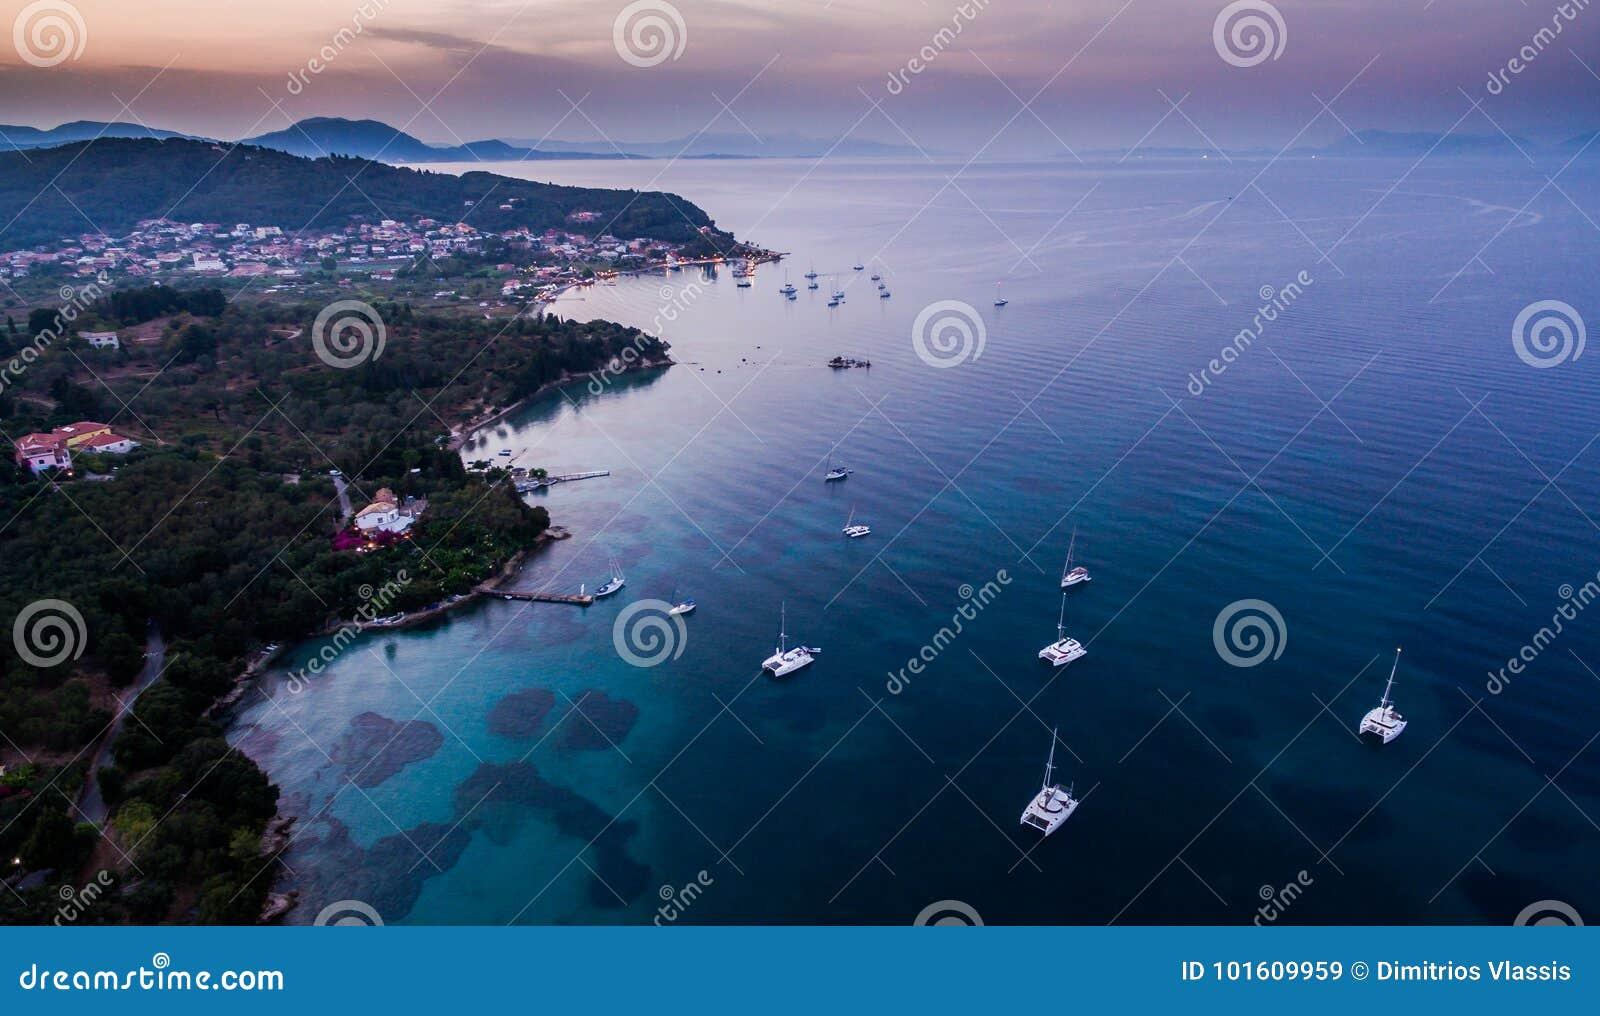 Amazing aerial shot of sunset coastline at South Corfu Greece.